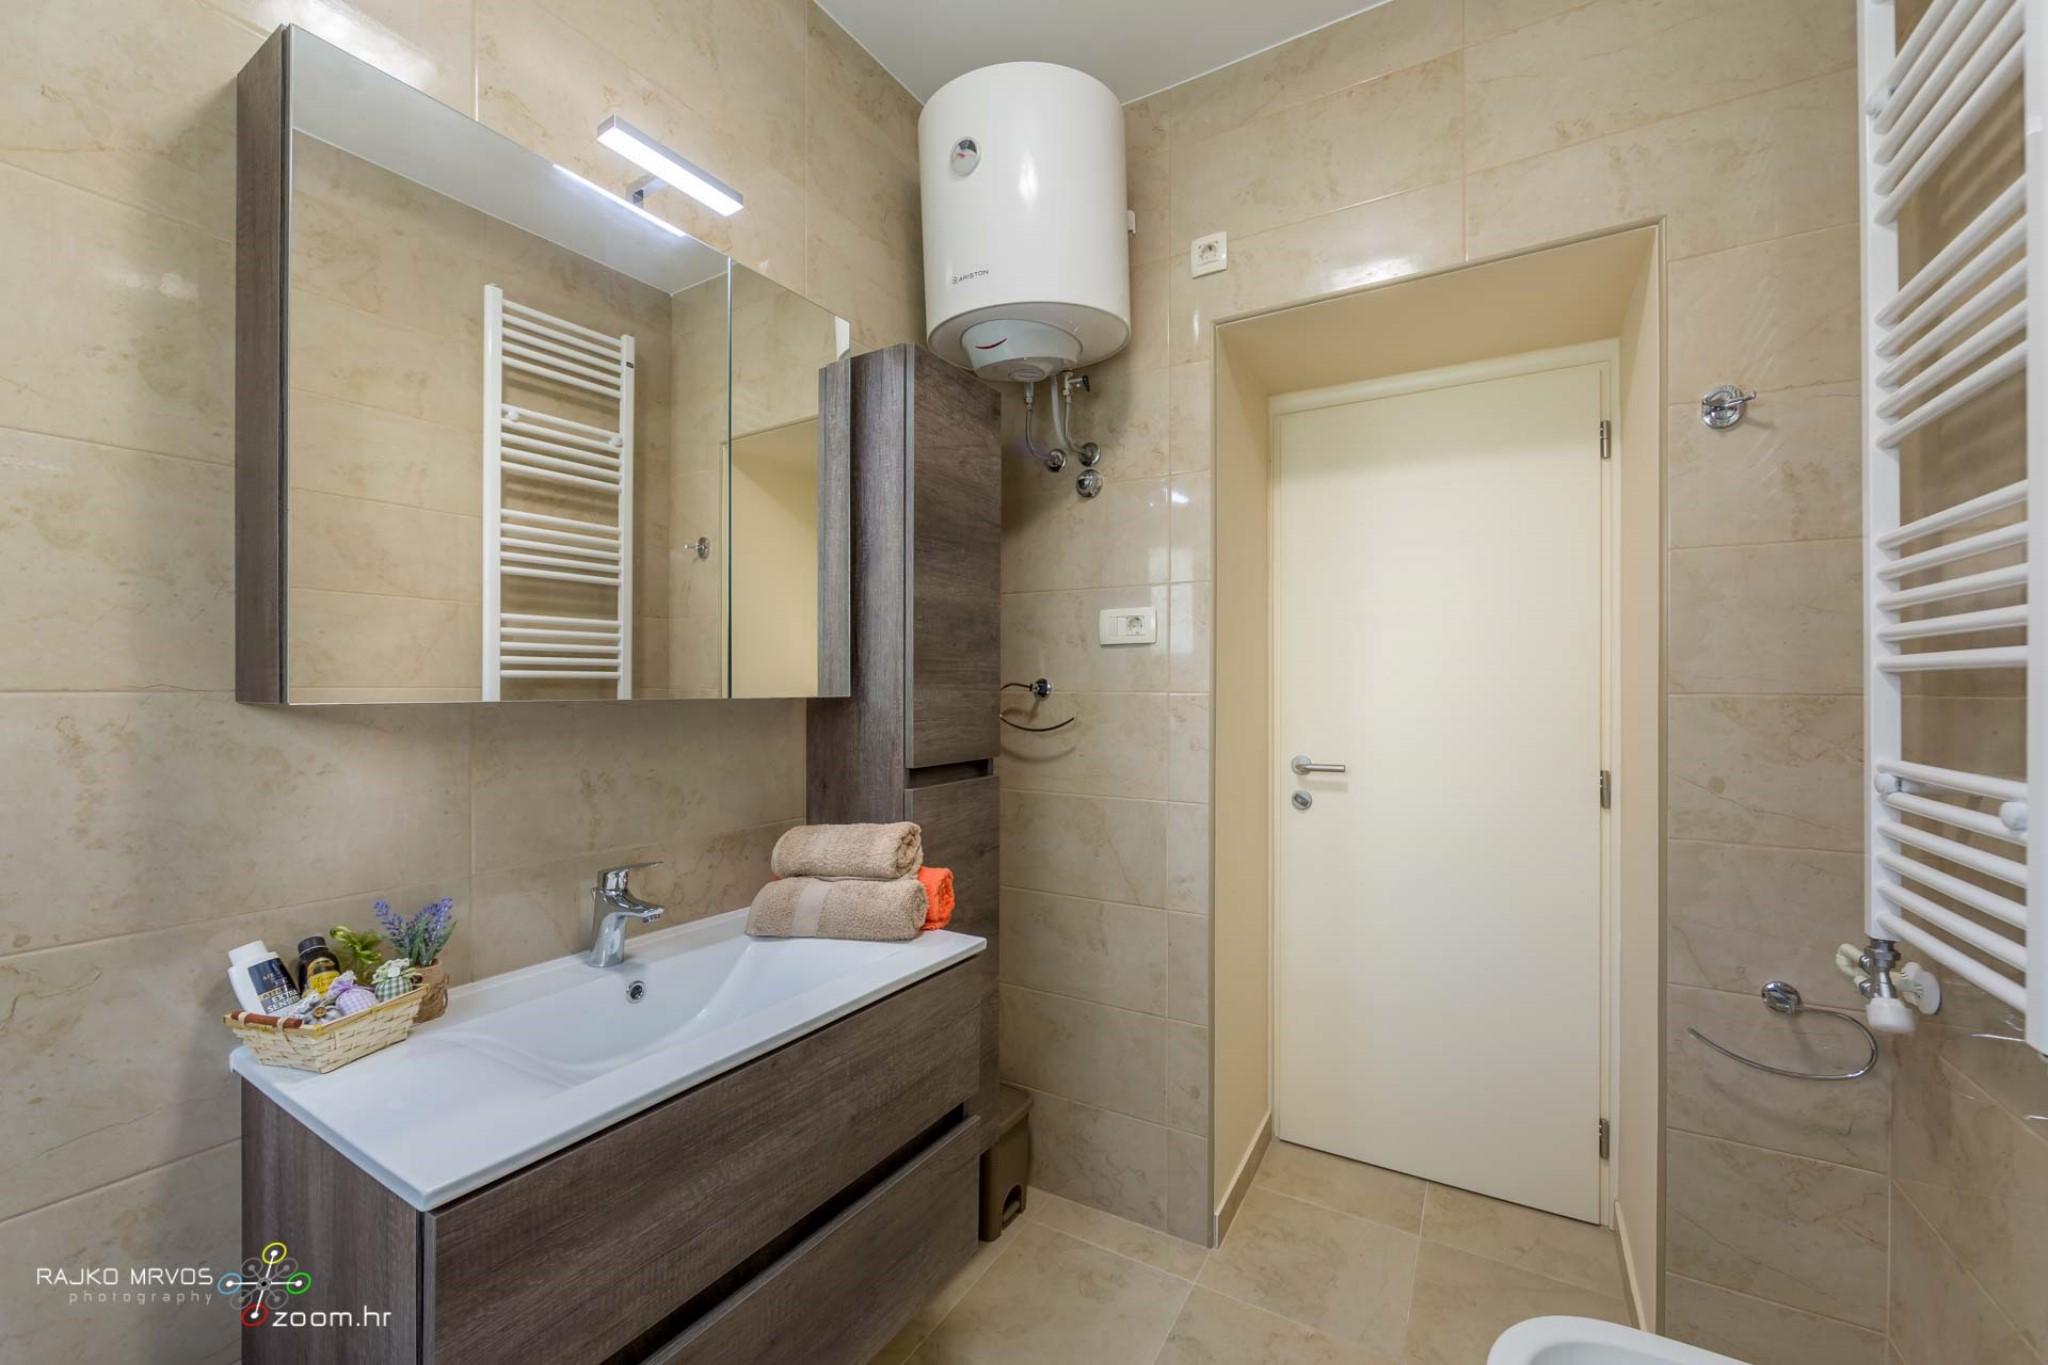 fotografiranje-interijera-fotograf-eksterijera-vila-apartmana-kuca-apartmani-Dujmic-17